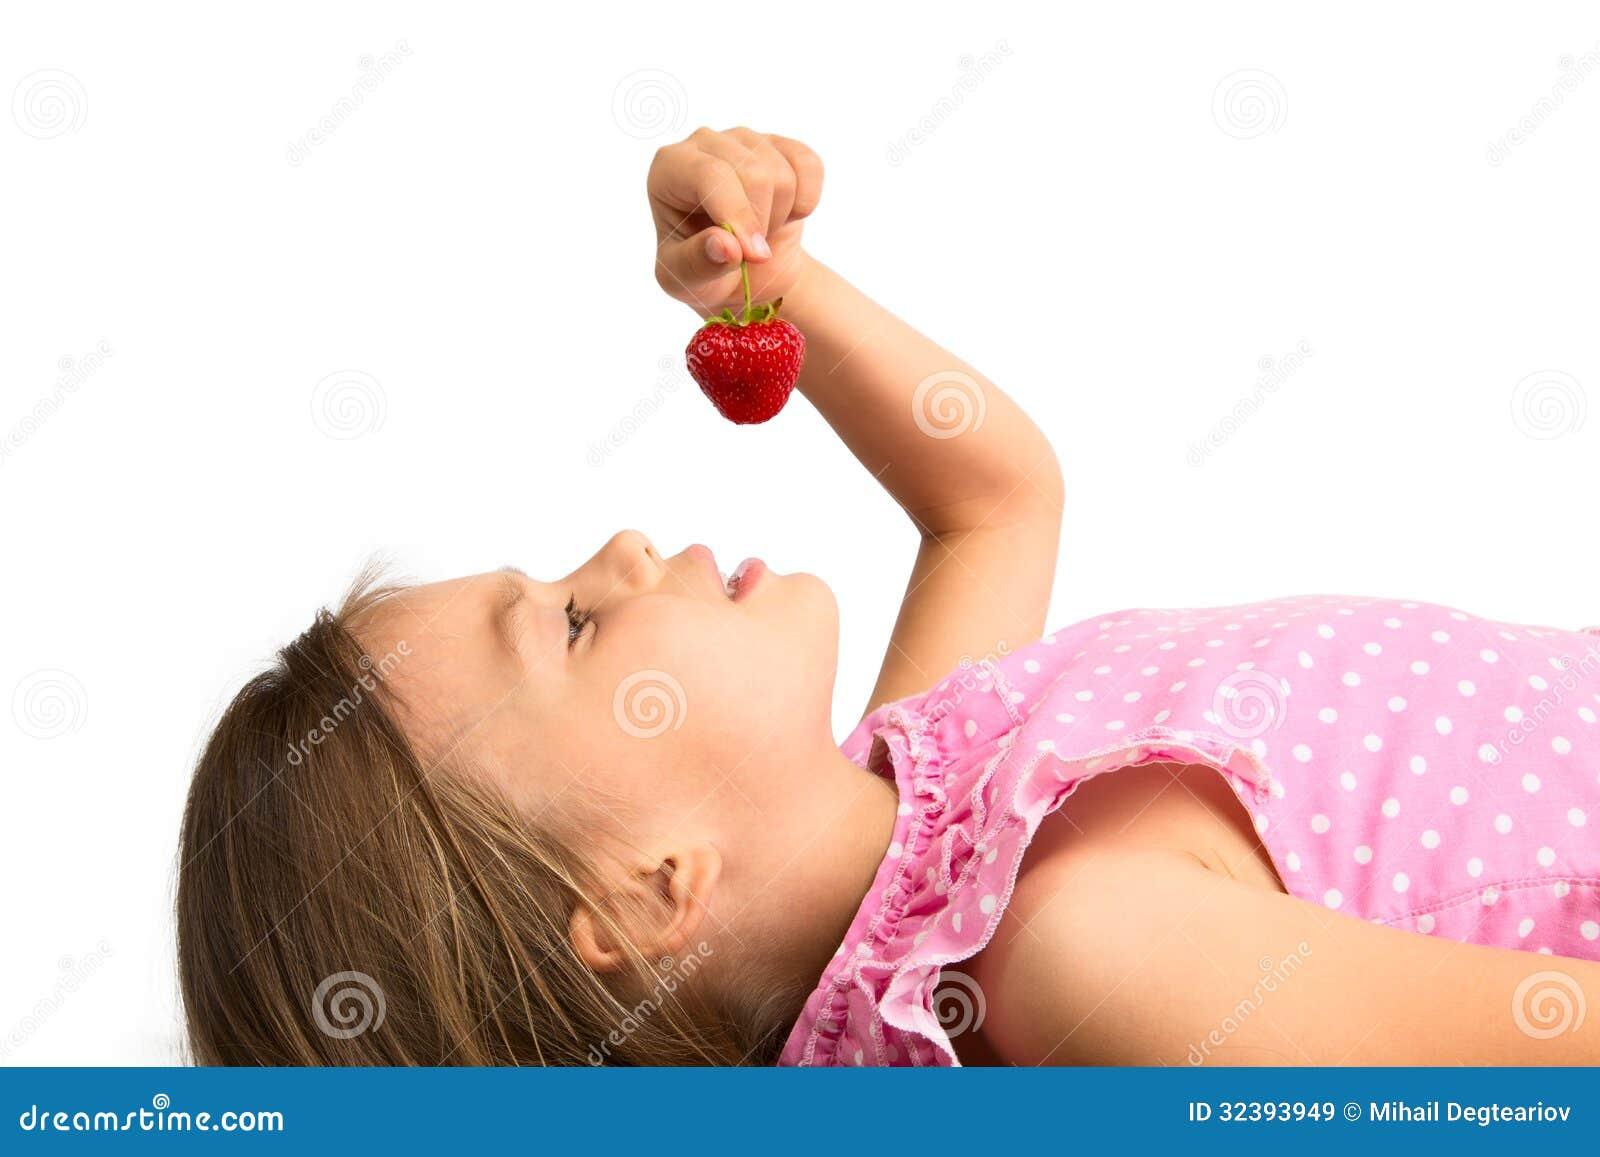 young-strawberry-girl-magazine